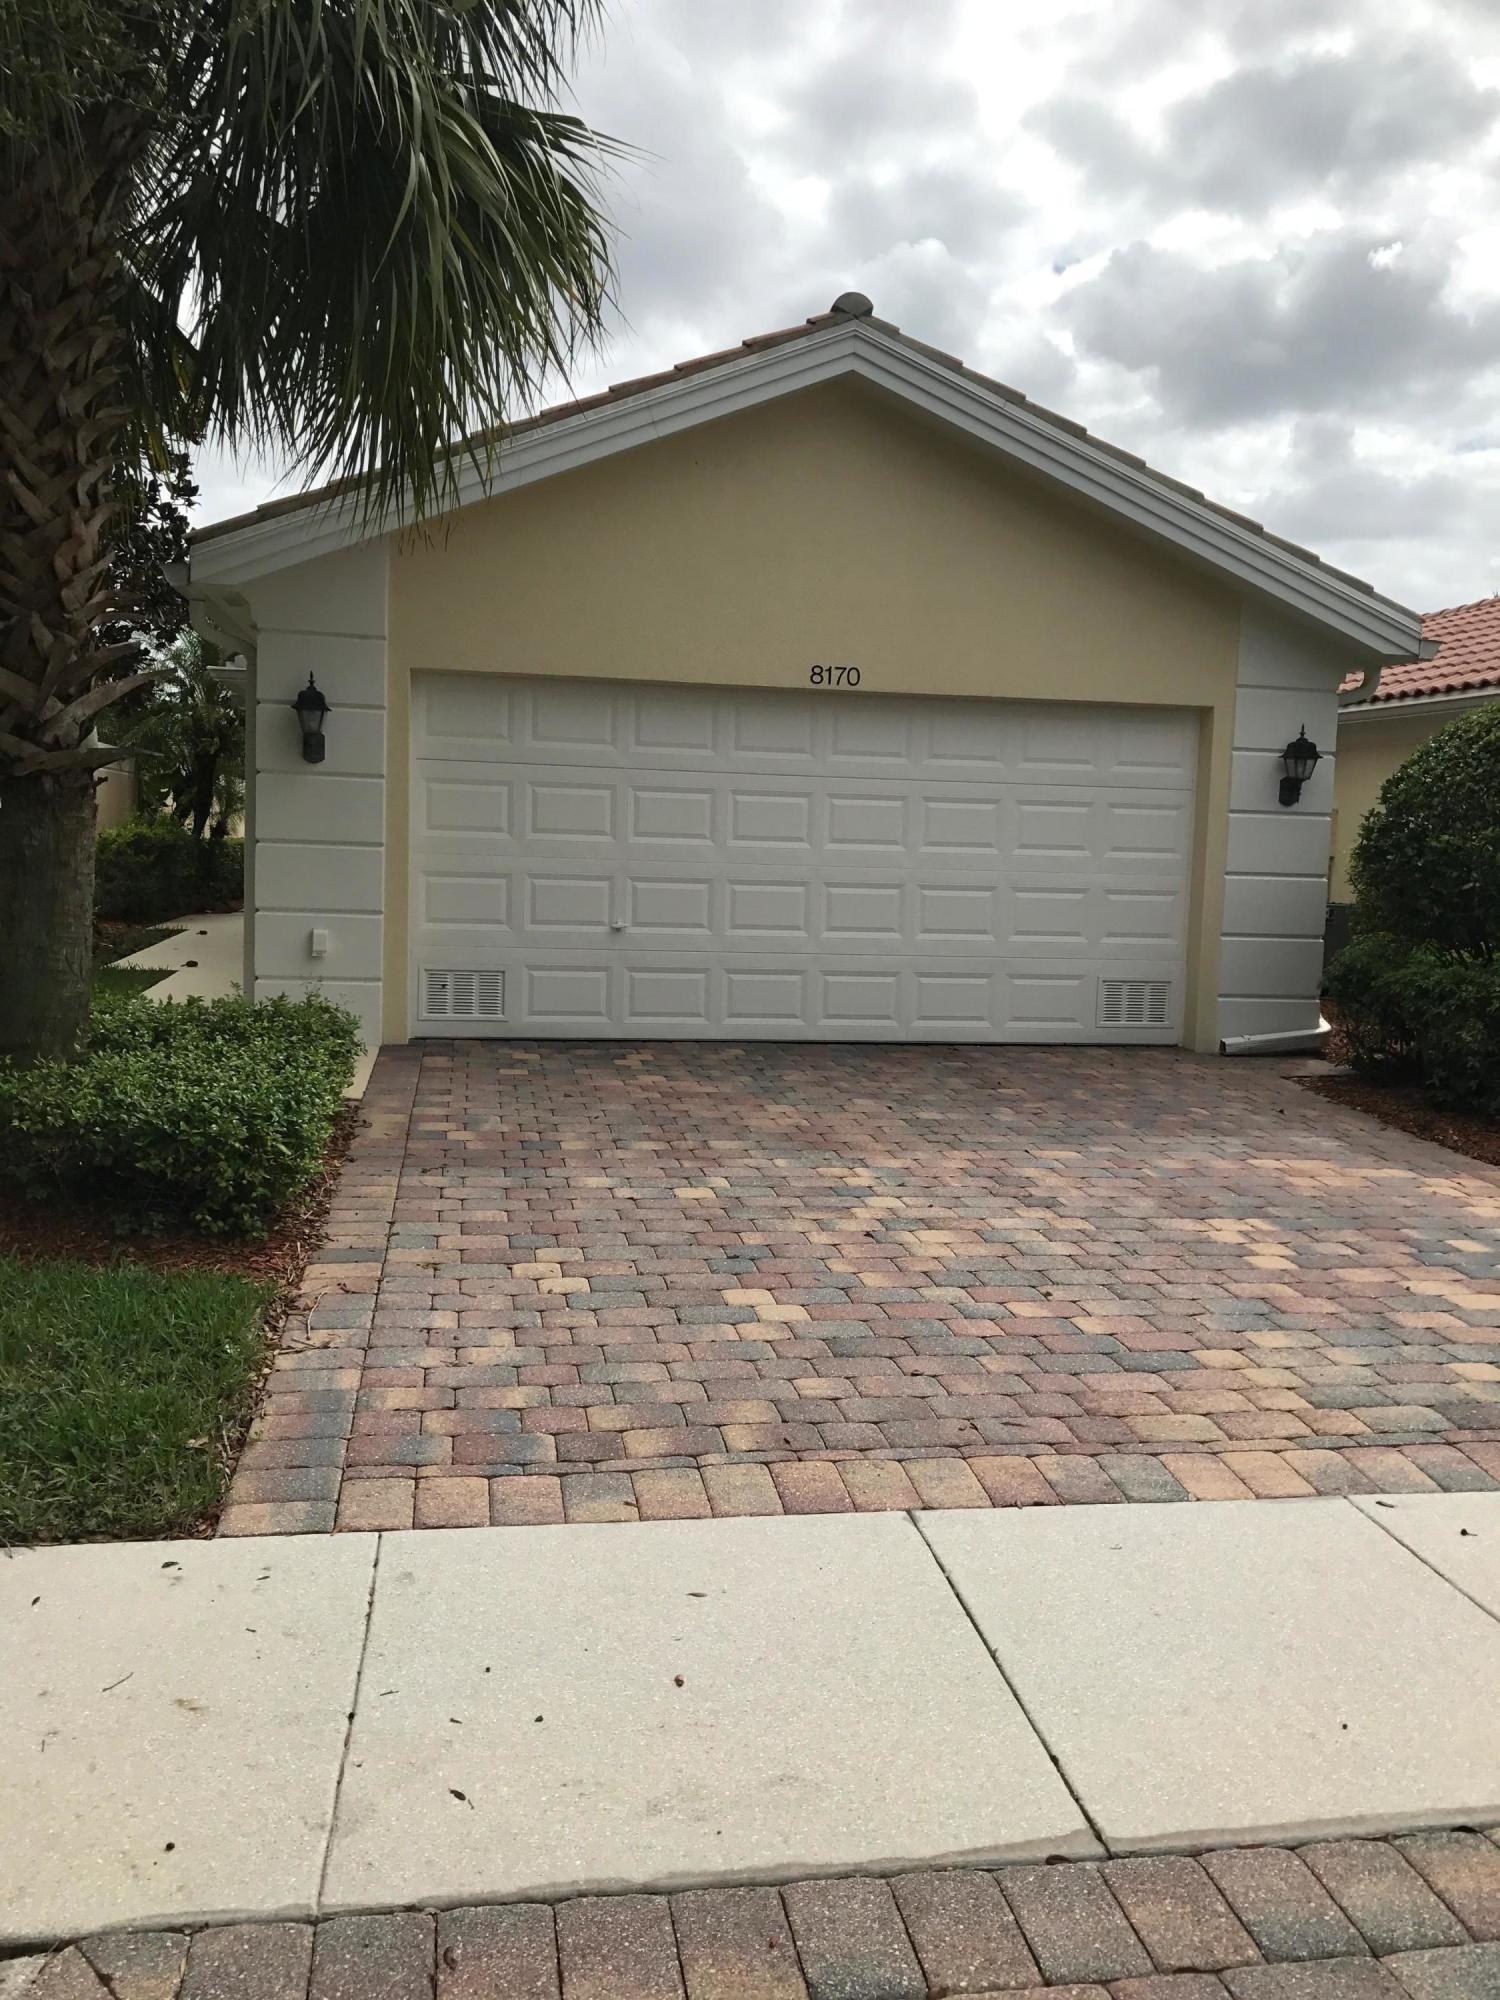 Villa للـ Sale في 8170 Saint Johns Court 8170 Saint Johns Court Wellington, Florida 33414 United States